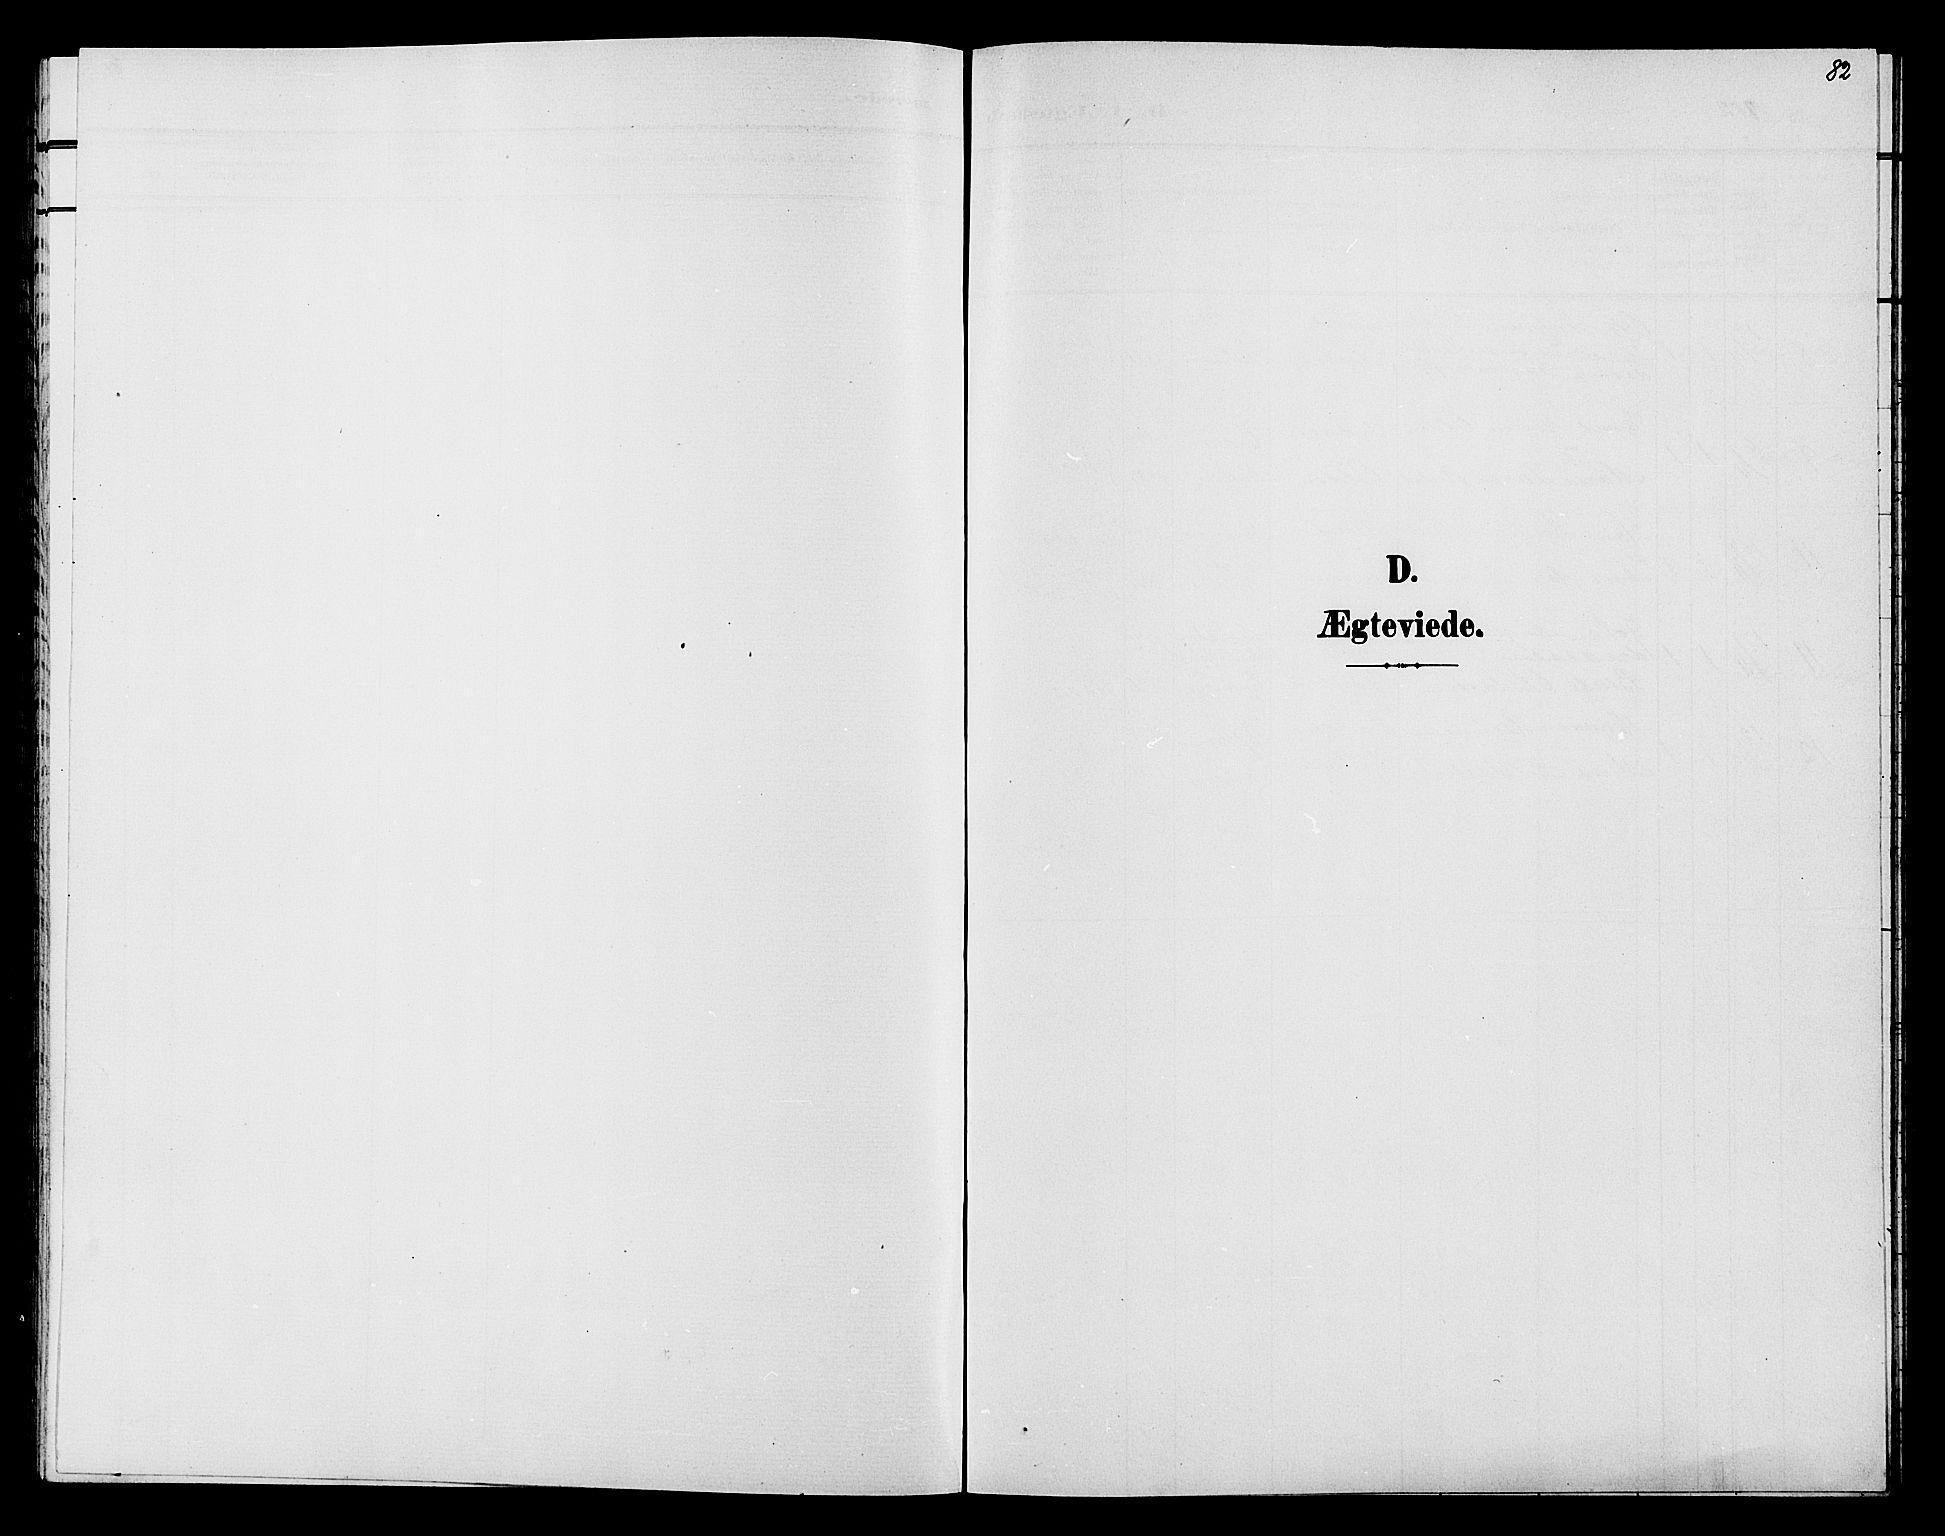 SAH, Søndre Land prestekontor, L/L0005: Klokkerbok nr. 5, 1902-1911, s. 82